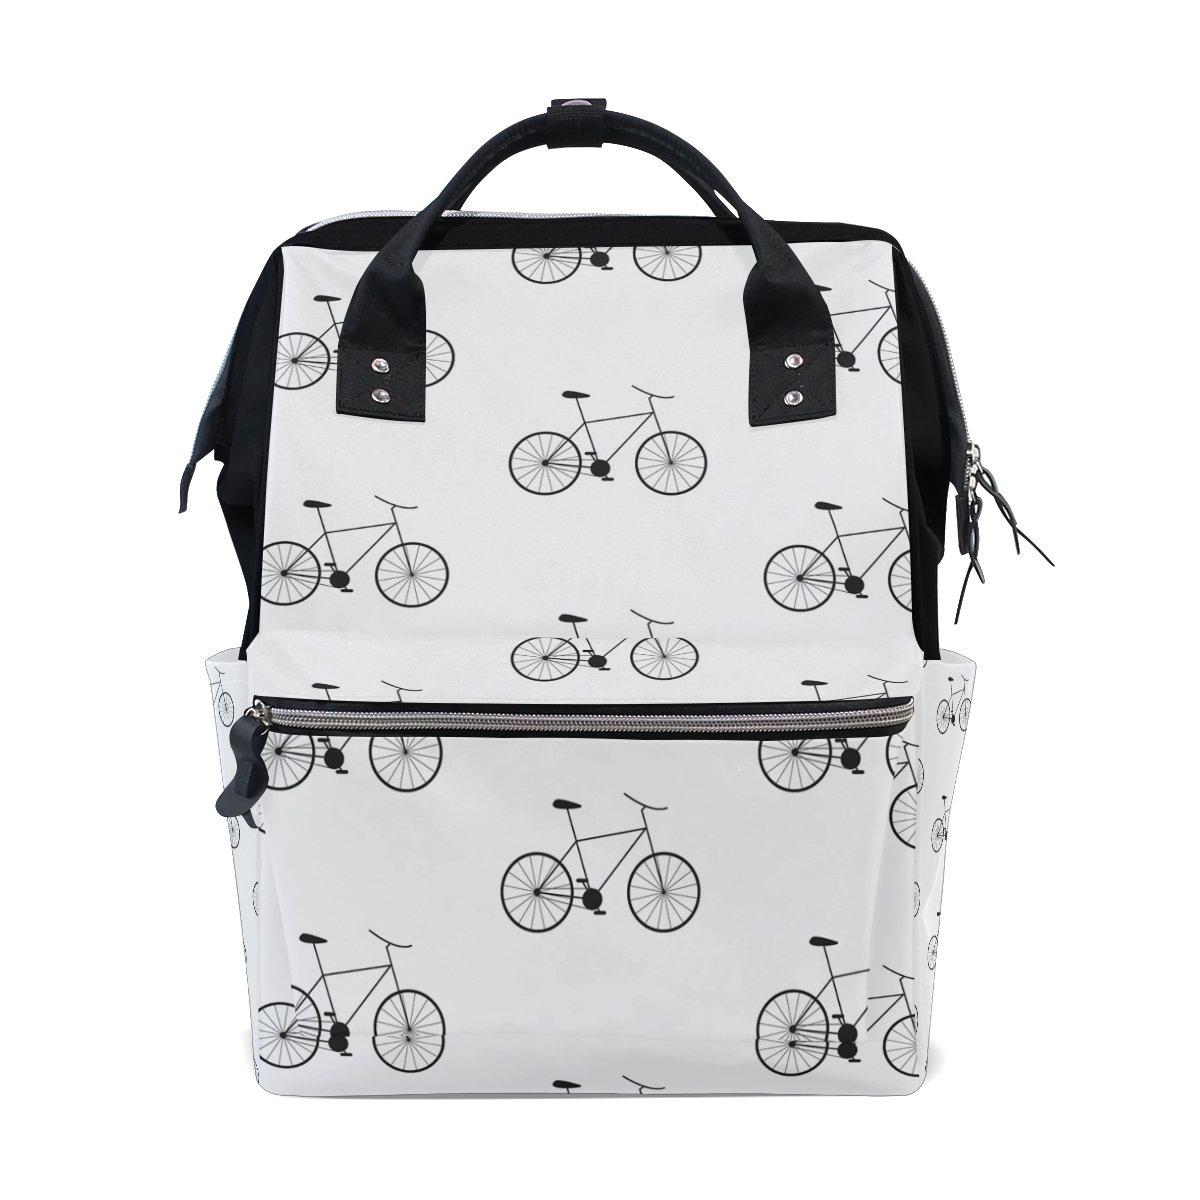 JSTeLノートパソコンカレッジバッグ学生旅行自転車Back andホワイト学校バックパックショルダートートバッグ   B078MK7SQS